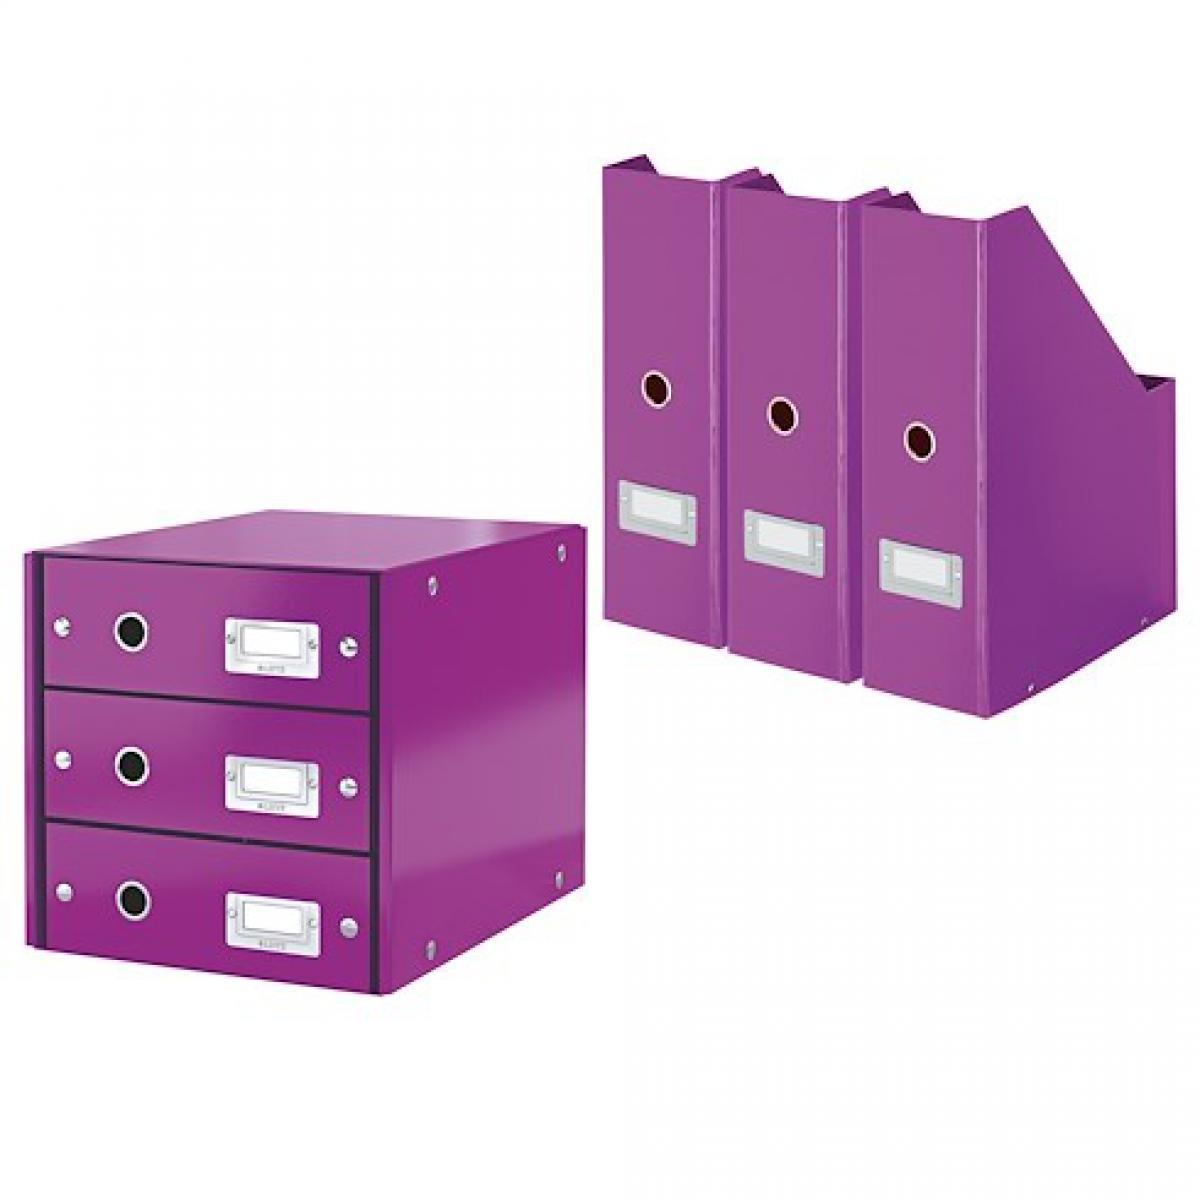 Exacompta Pack module de classement + 3 range-revues Exacompta Offissimo violets